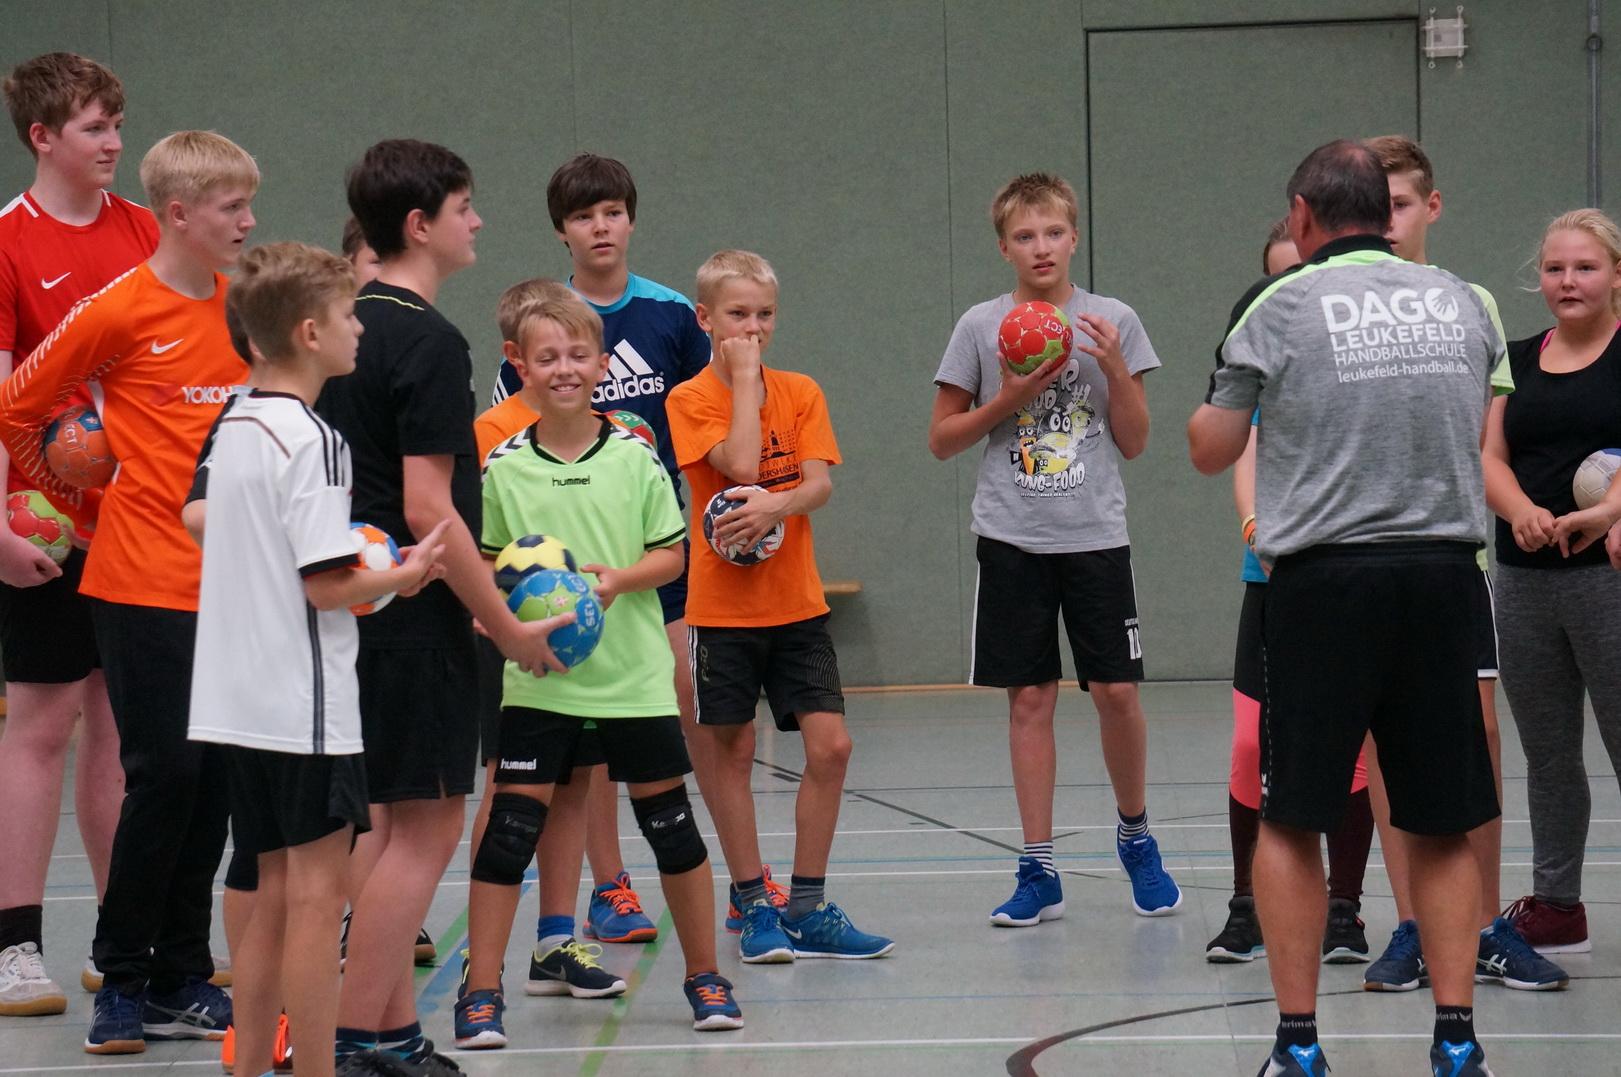 201808_Handballcamp_SDH_MG_033w